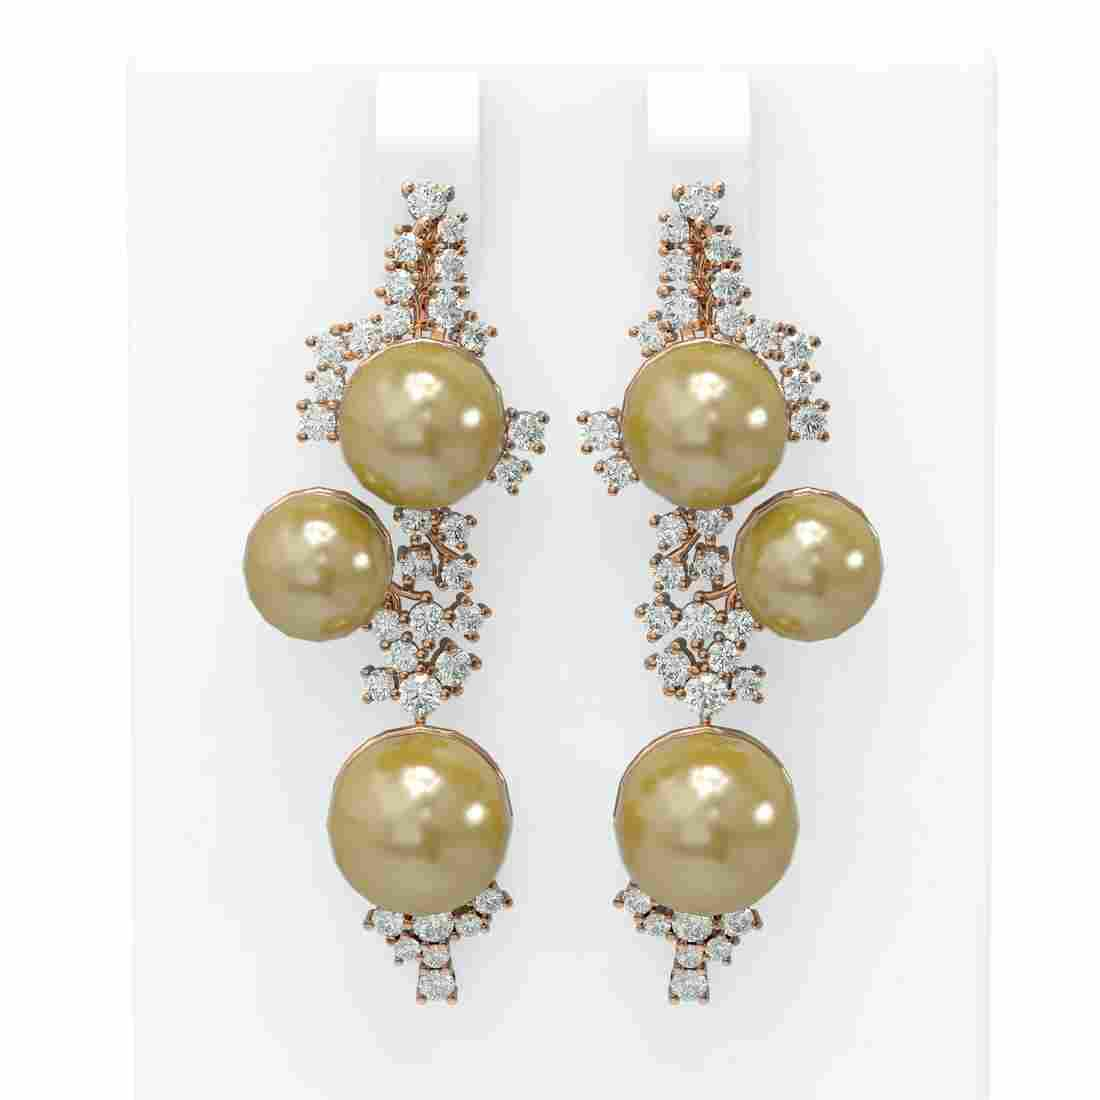 2.43 ctw Diamond & Pearl Earrings 18K Rose Gold -